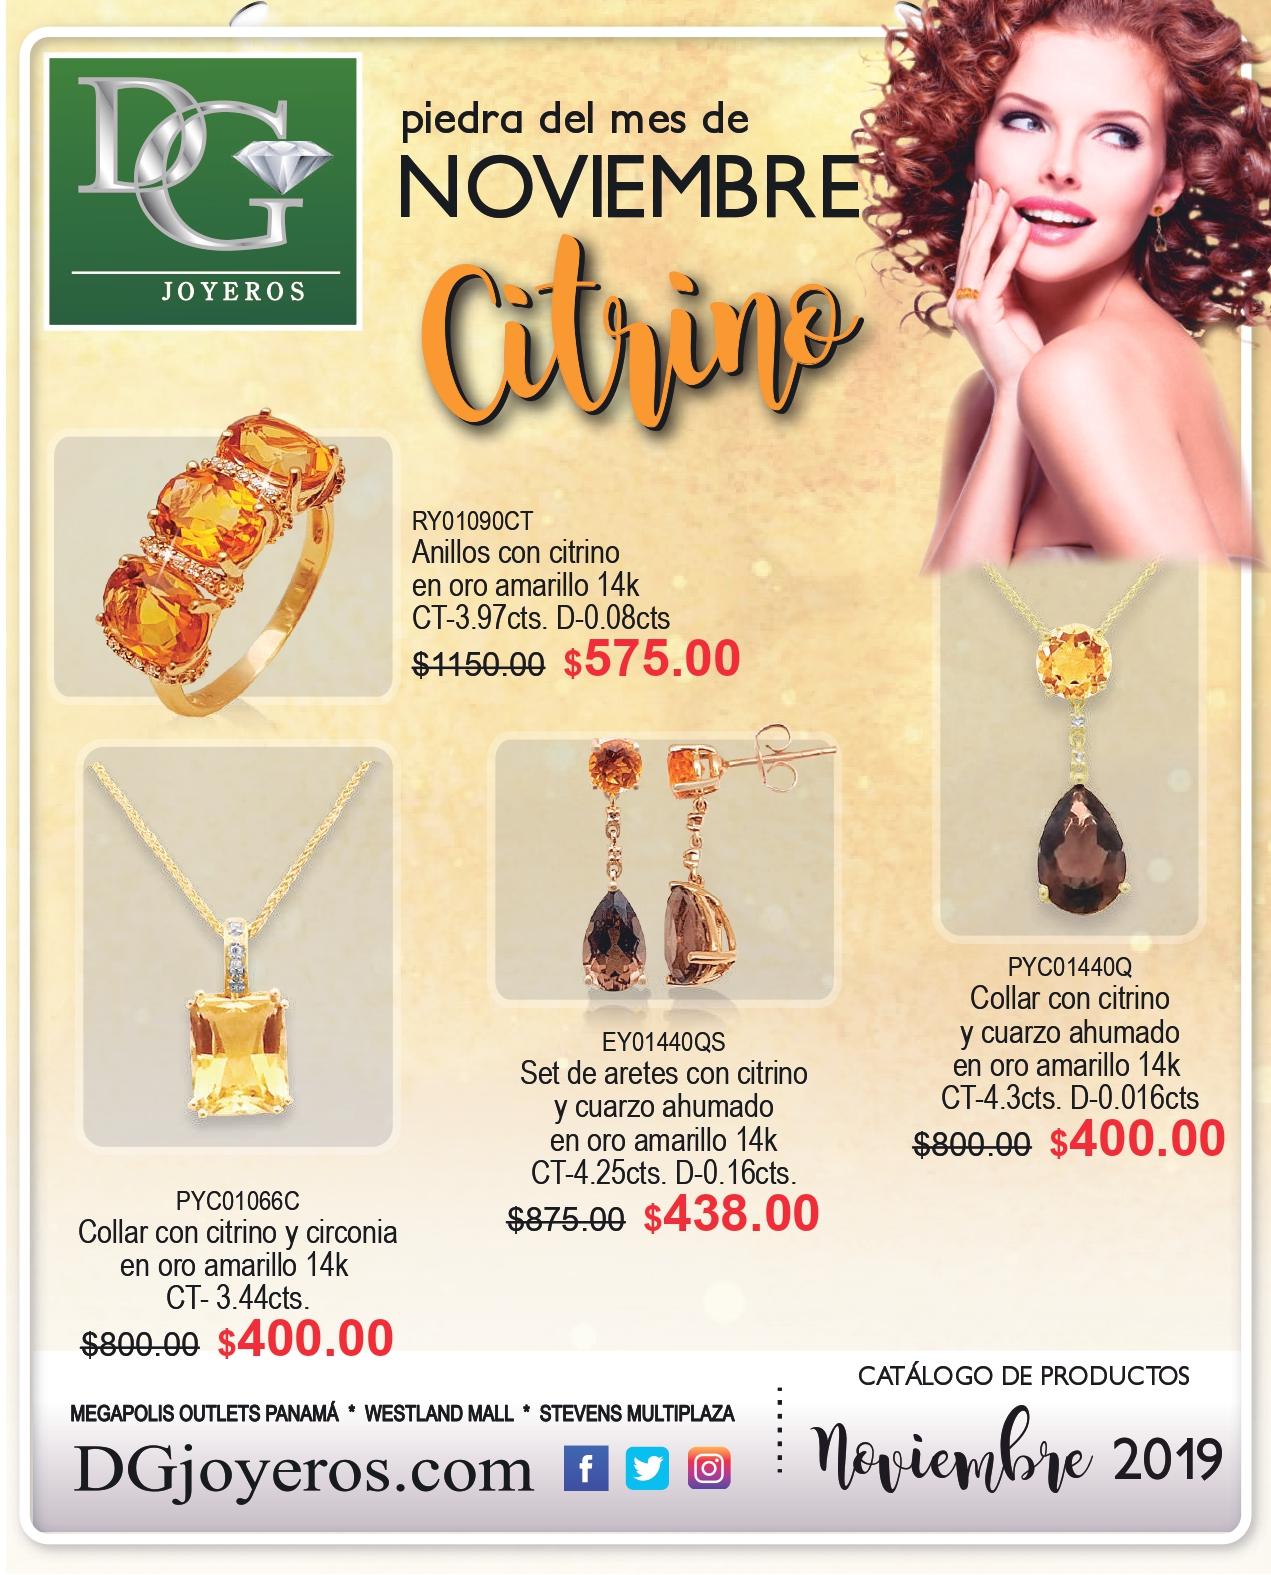 Catalogo DG Joyeros Noviembre 2019 p1